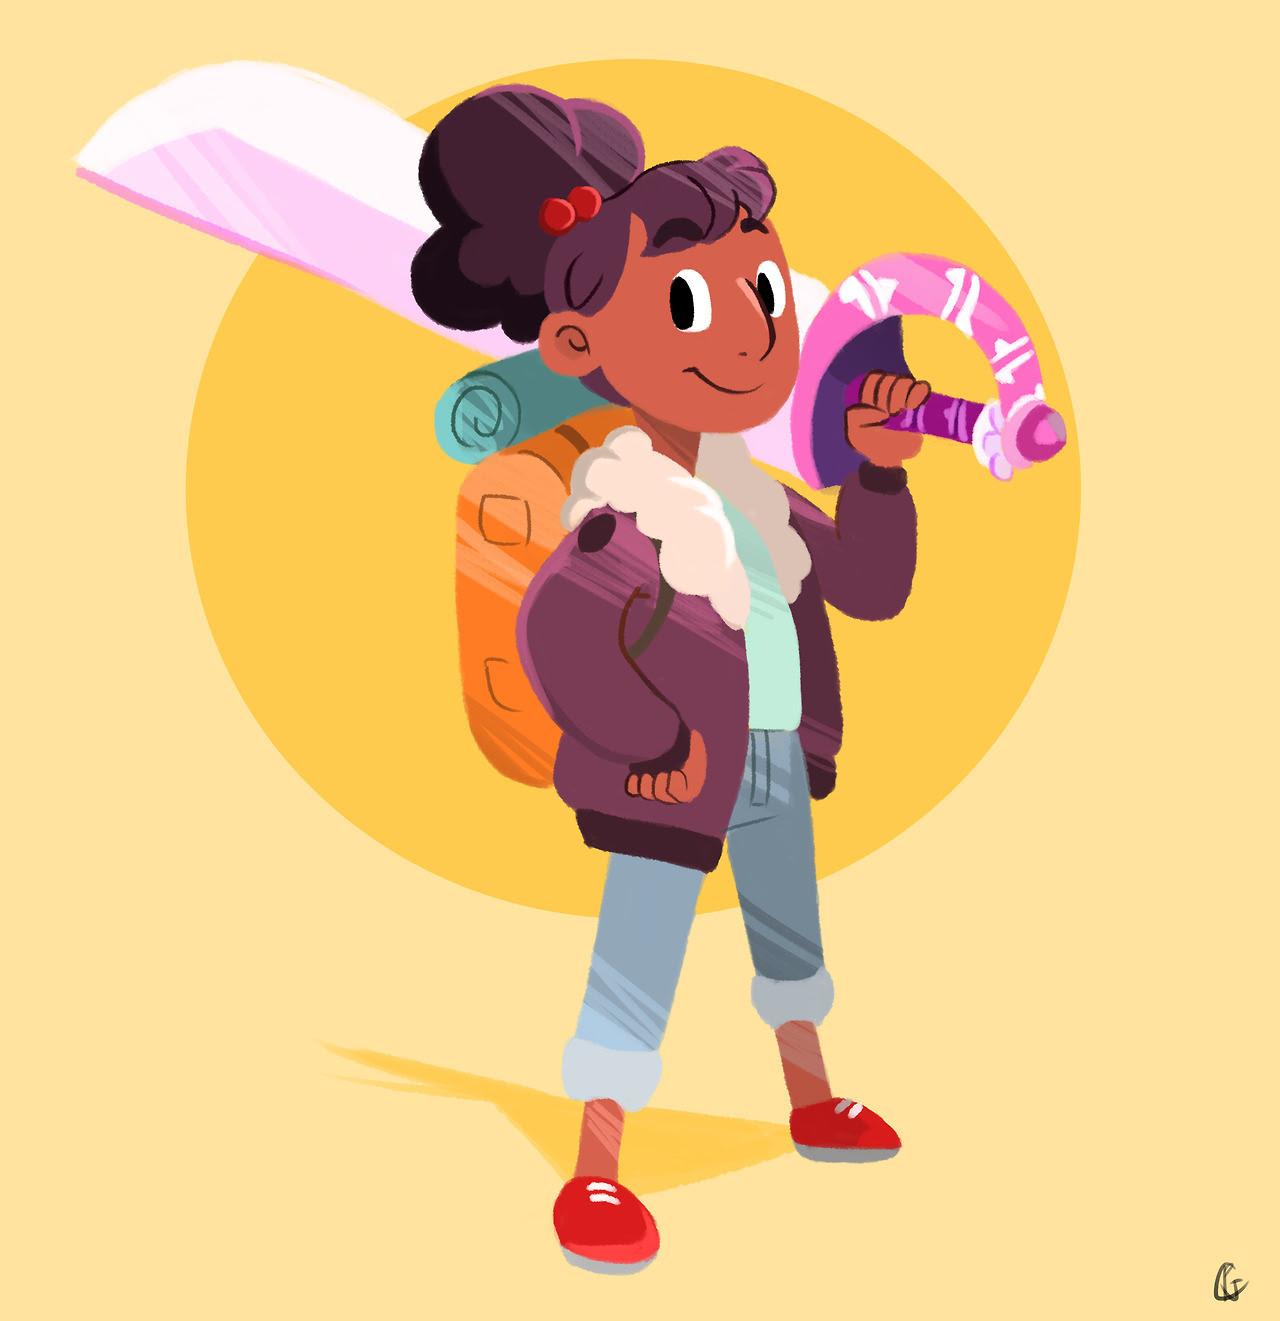 BUN head connie, LOVE her redesign!